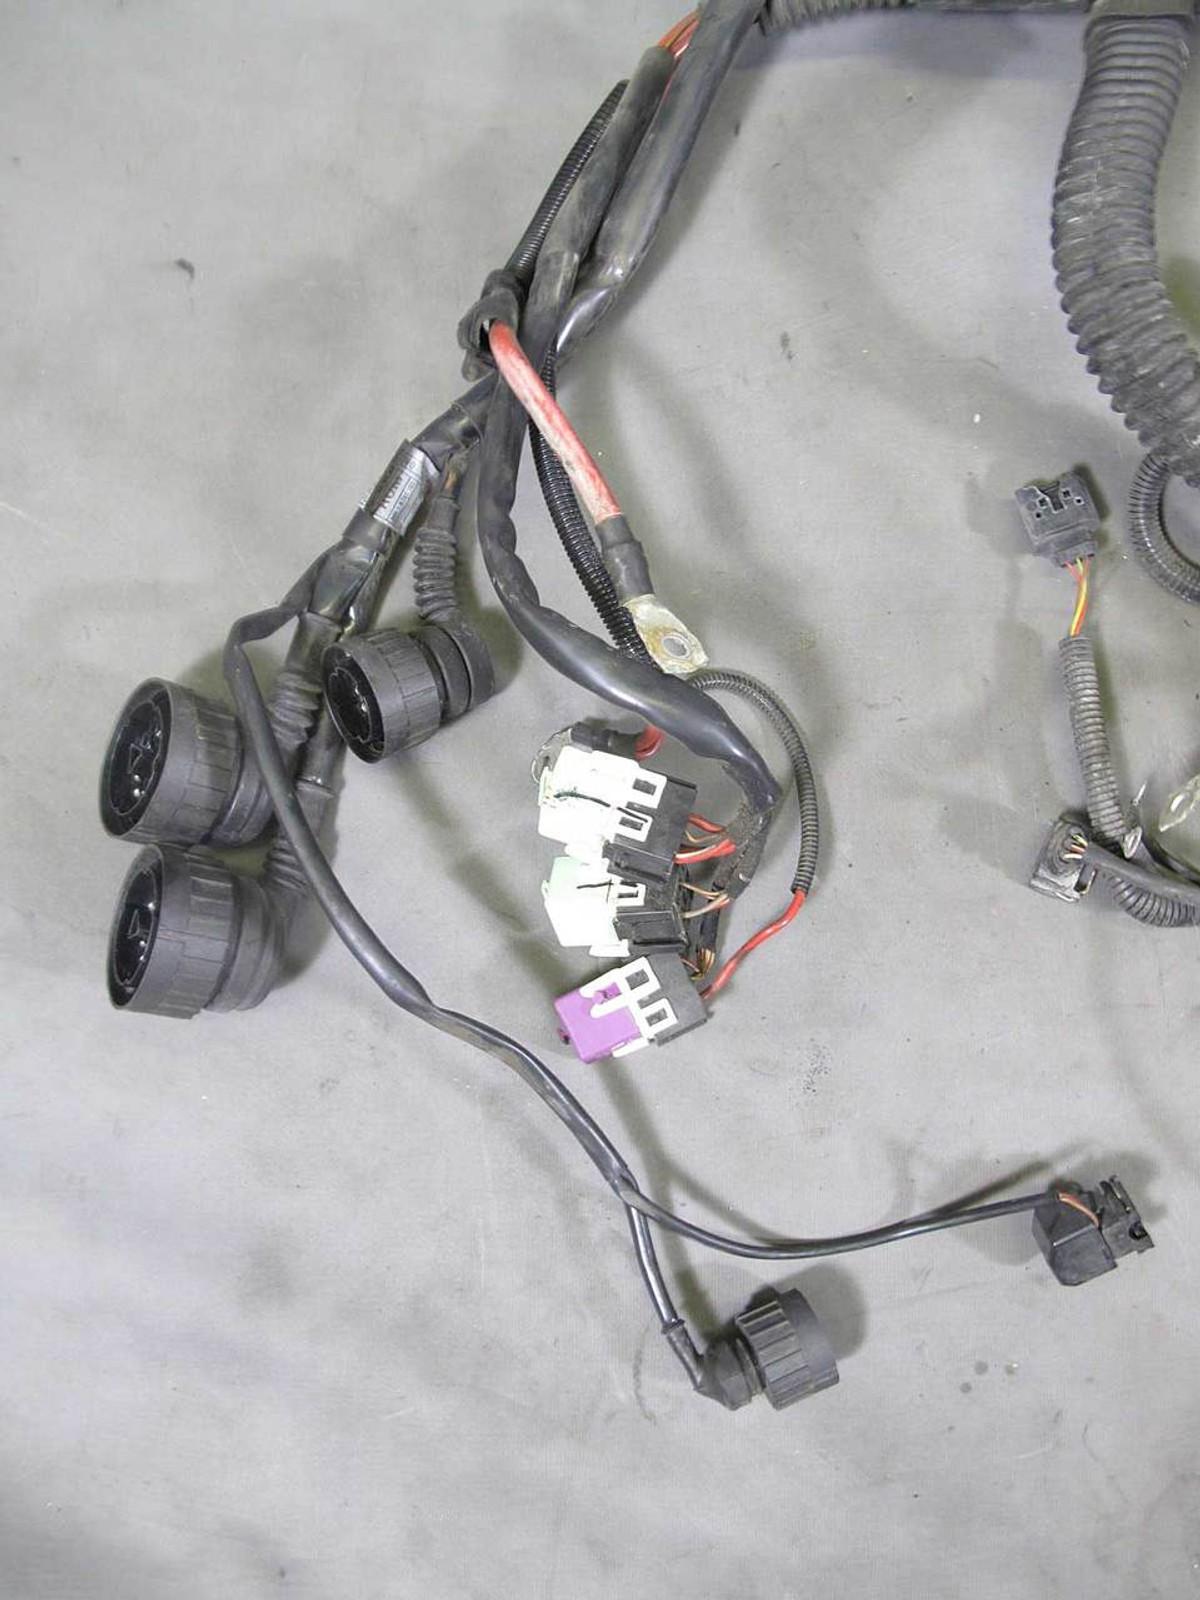 bmw e36 engine wiring harness manual asc t 97 98 99 328i 328is 328ic rh prussianmotors com 2003 BMW 325I Wiring Harness wiring harness bmw 328i